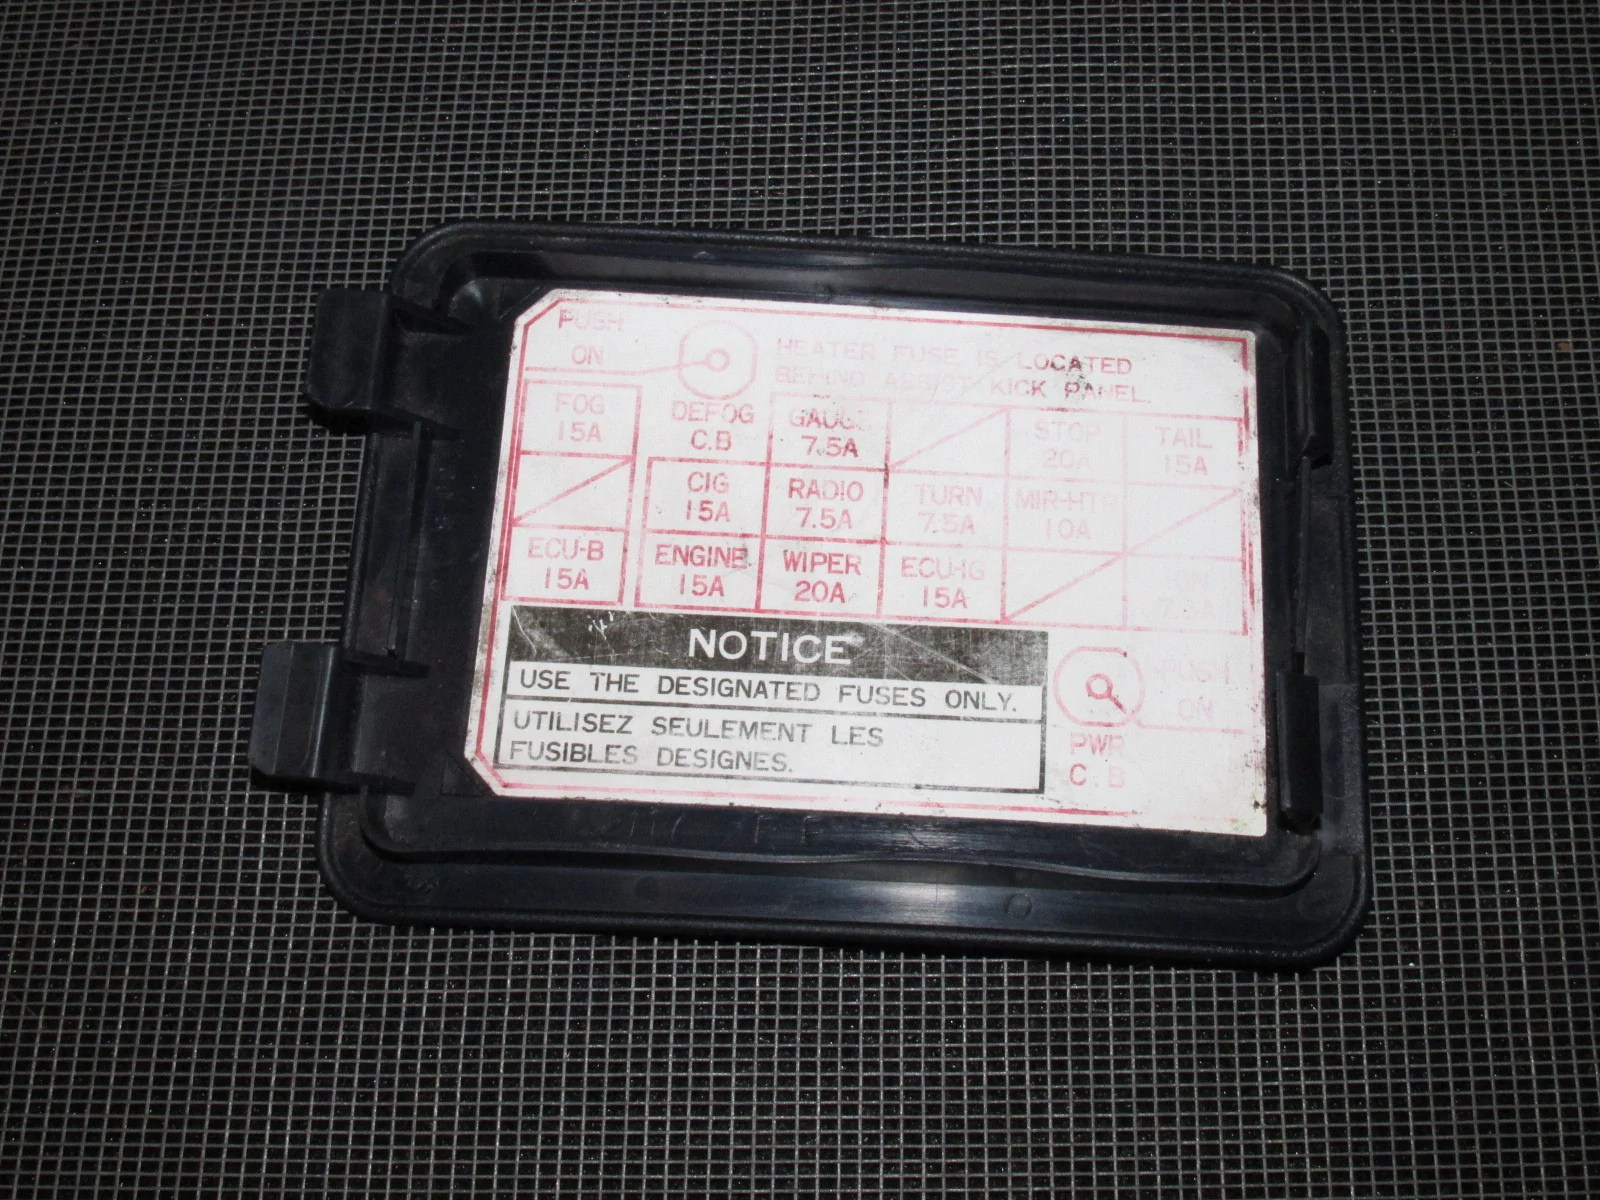 89 toyota fuse box wiring diagram 89 corolla fuse box [ 1600 x 1200 Pixel ]